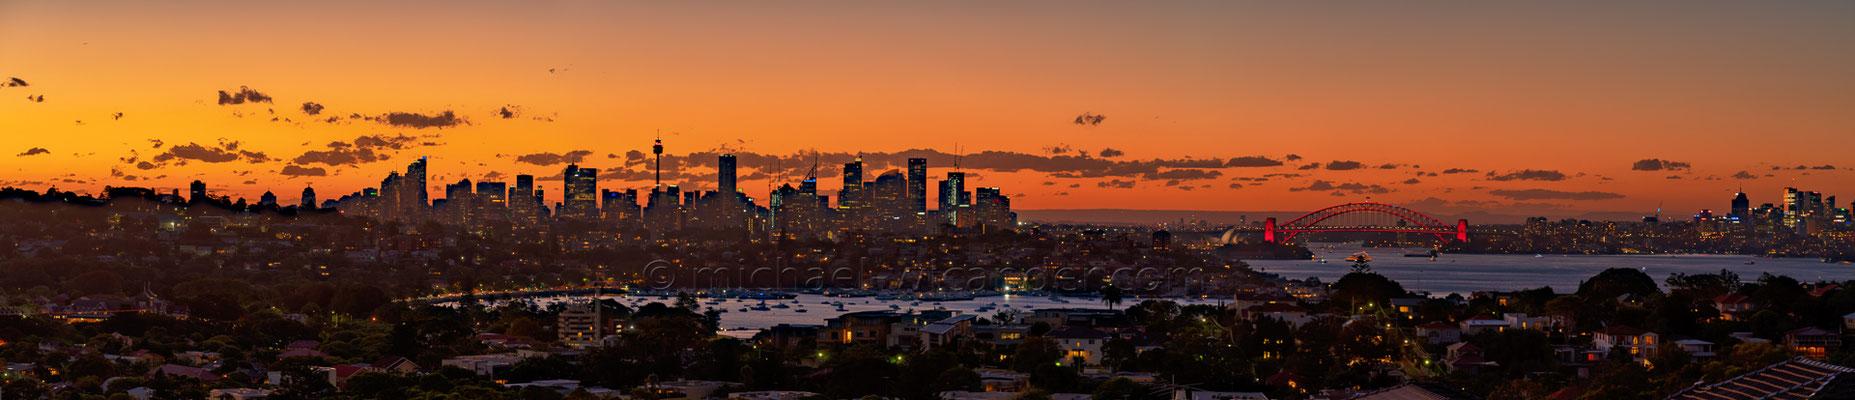 Sydney Skyline Panorama 19 13